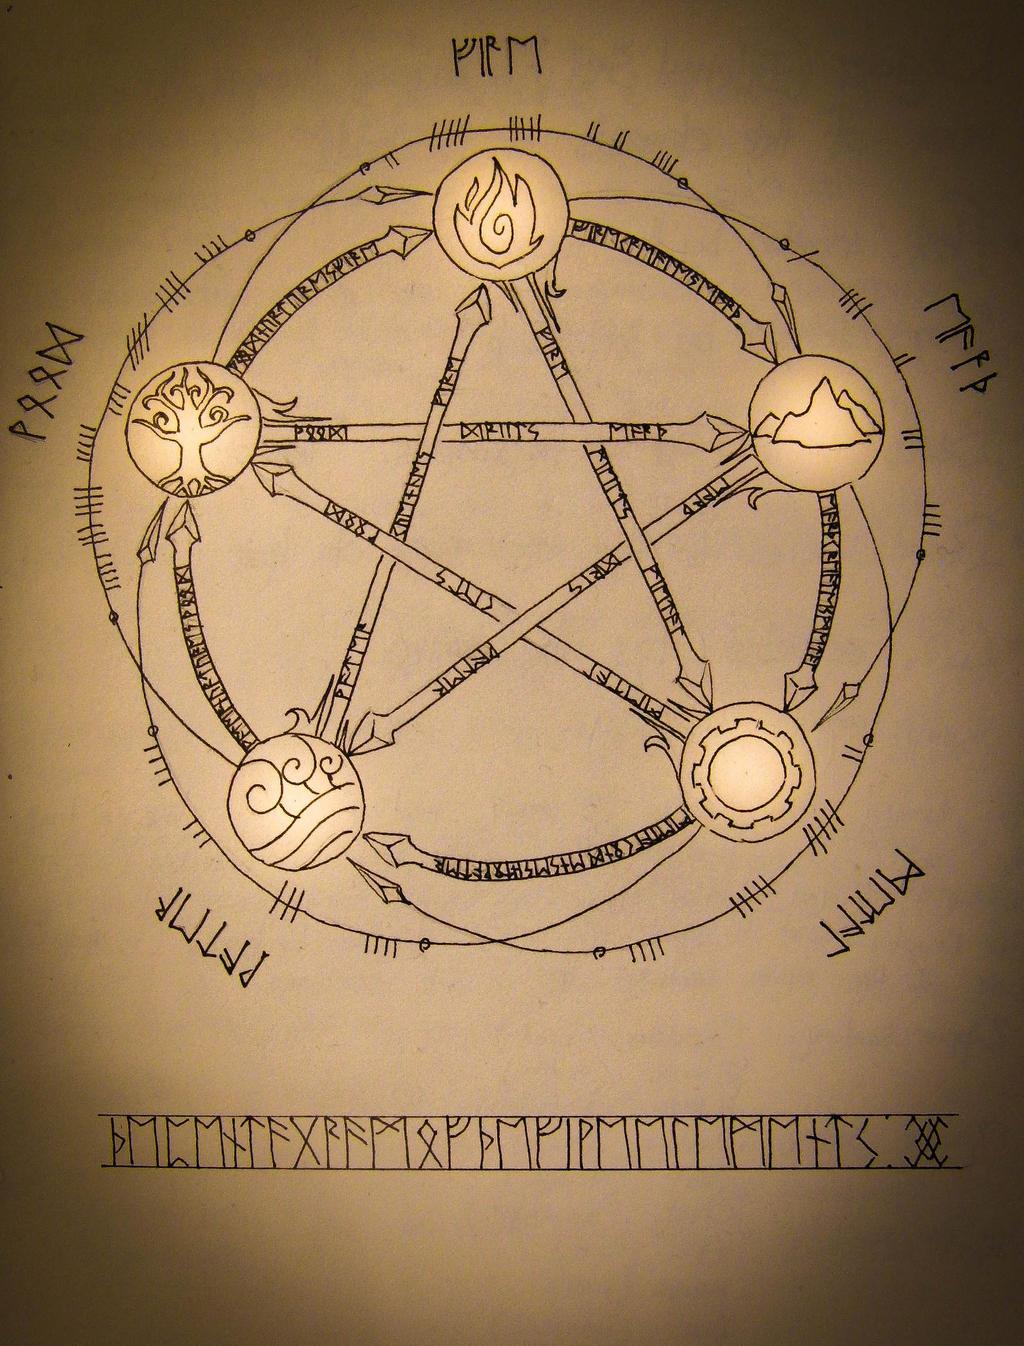 Five Elements Art : Pentagram five elements by nirnaeth en ainur on deviantart